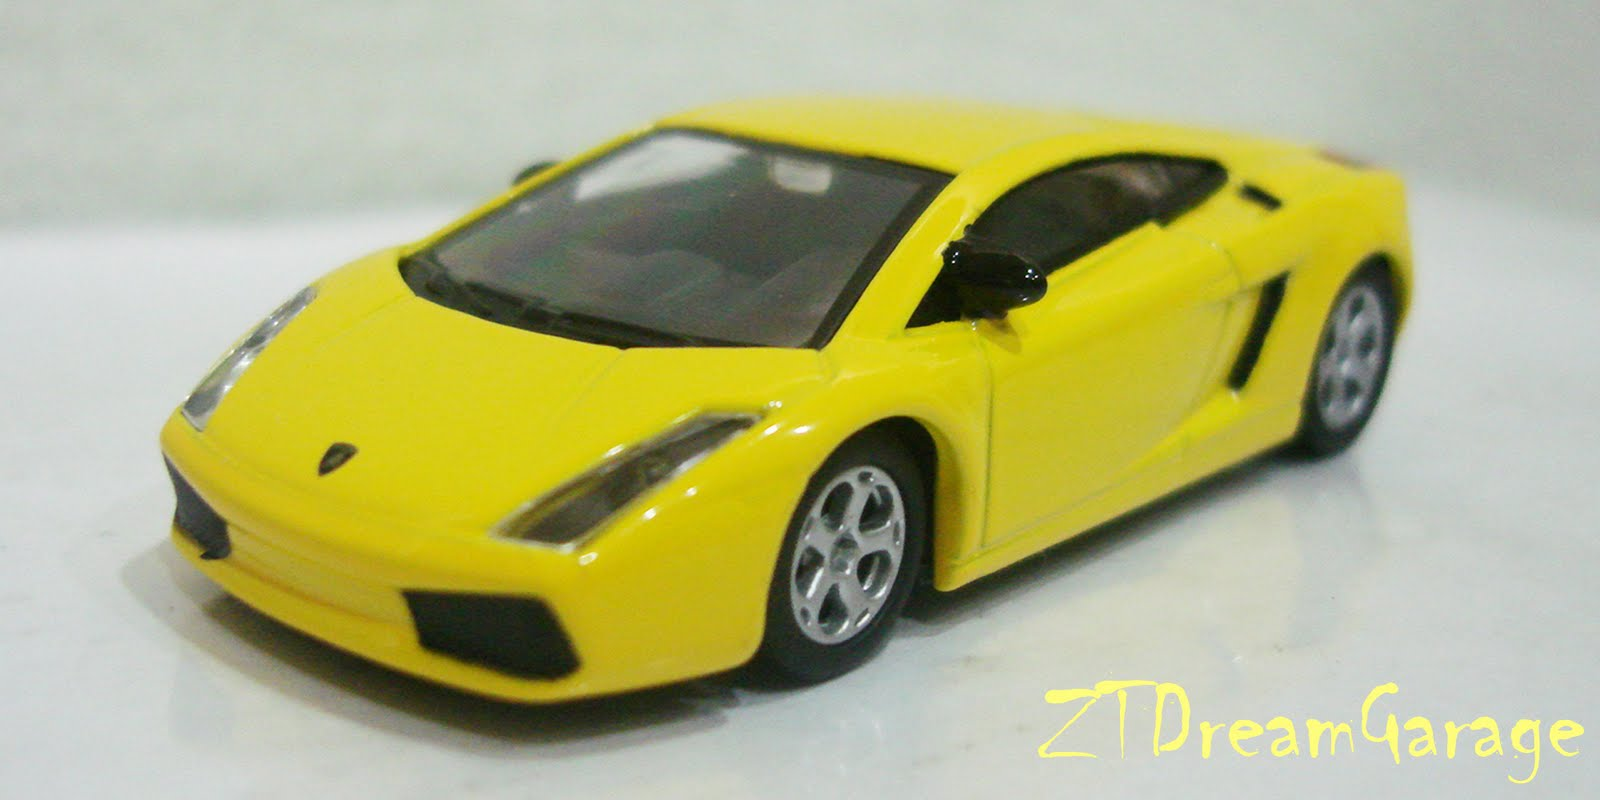 Zt S Dream Garage Greenlight Lamborghini Gallardo Yellow